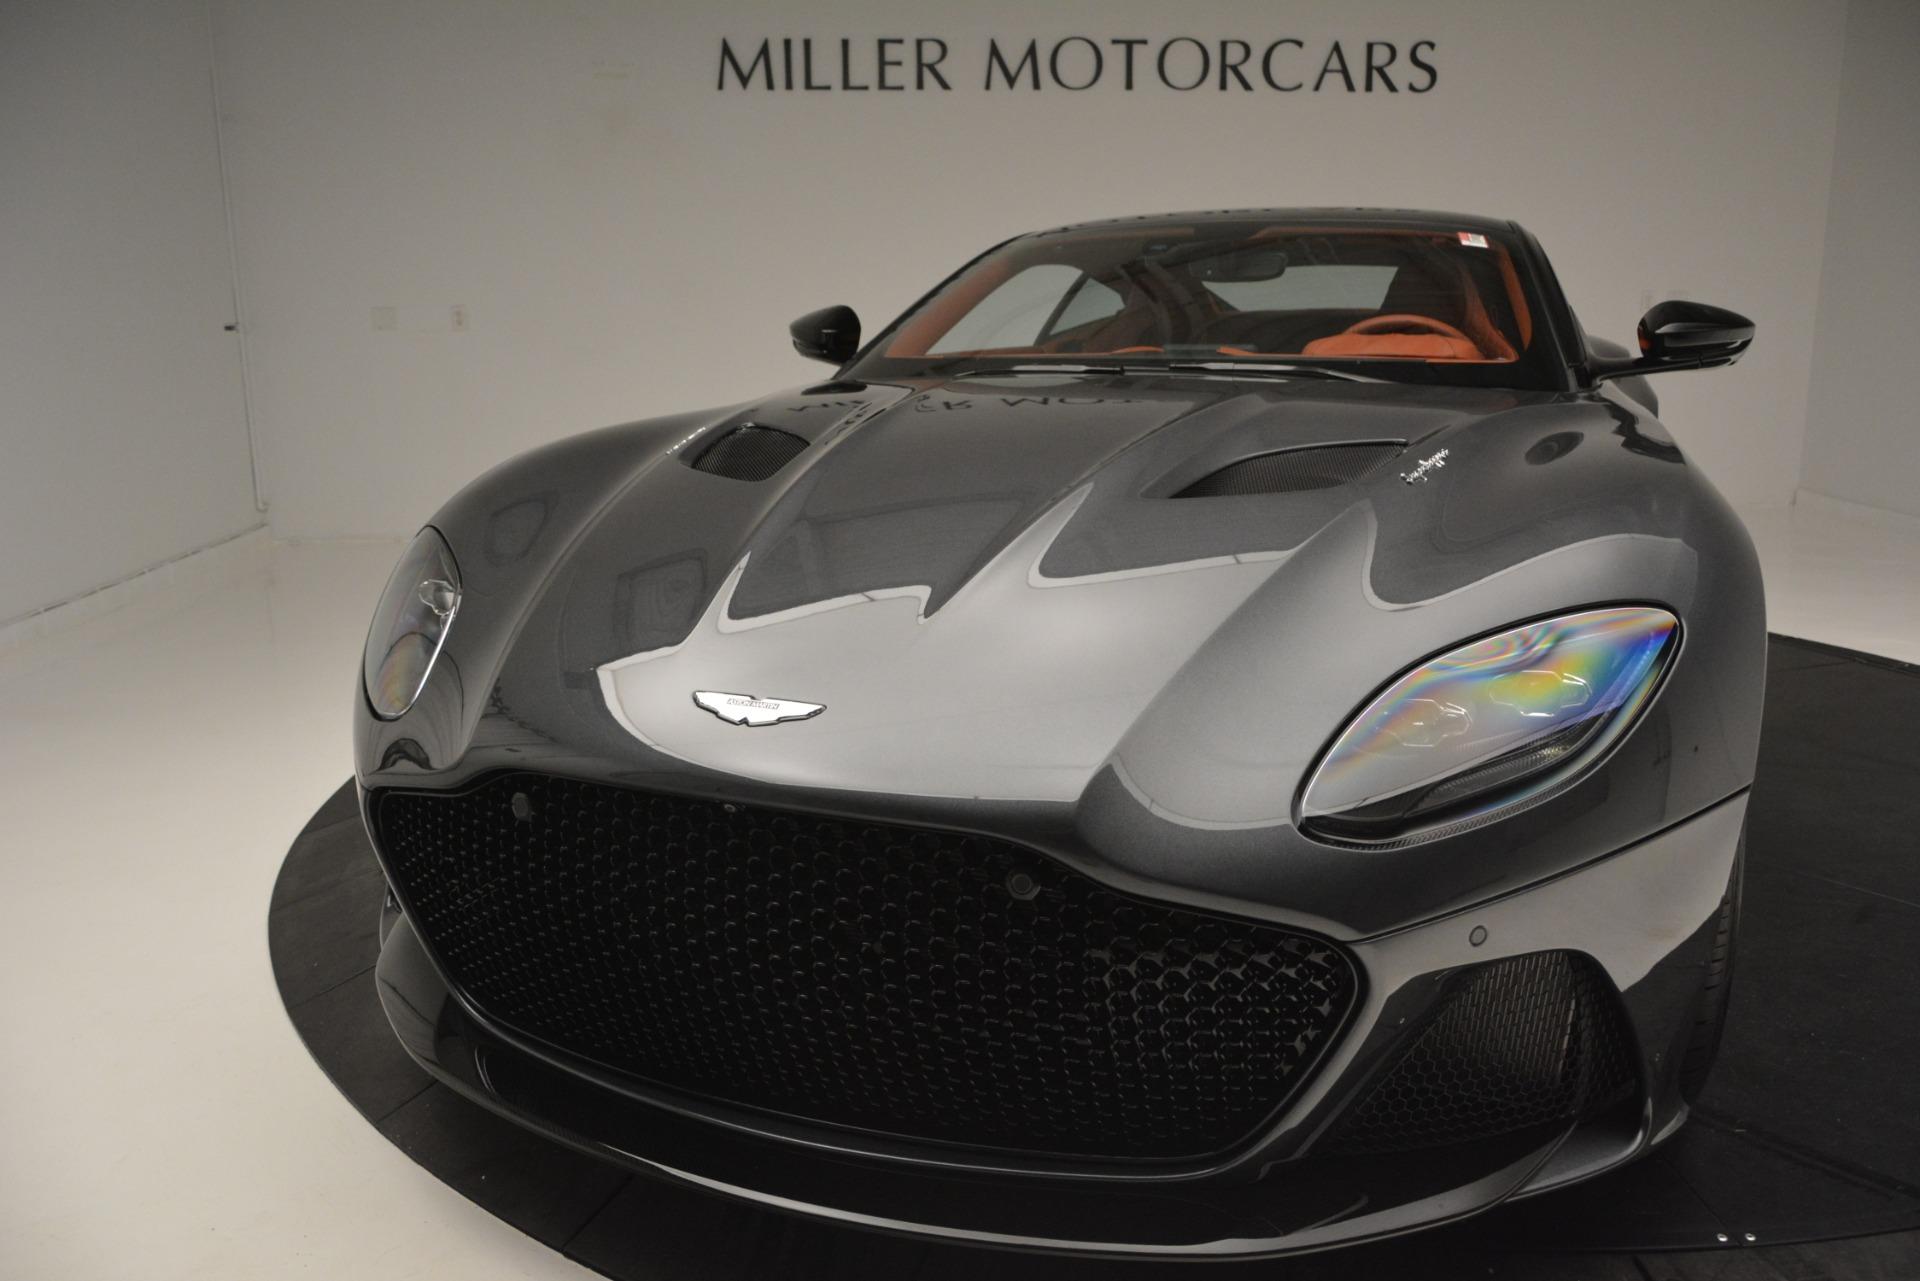 New 2019 Aston Martin DBS Superleggera For Sale In Greenwich, CT 2827_p15